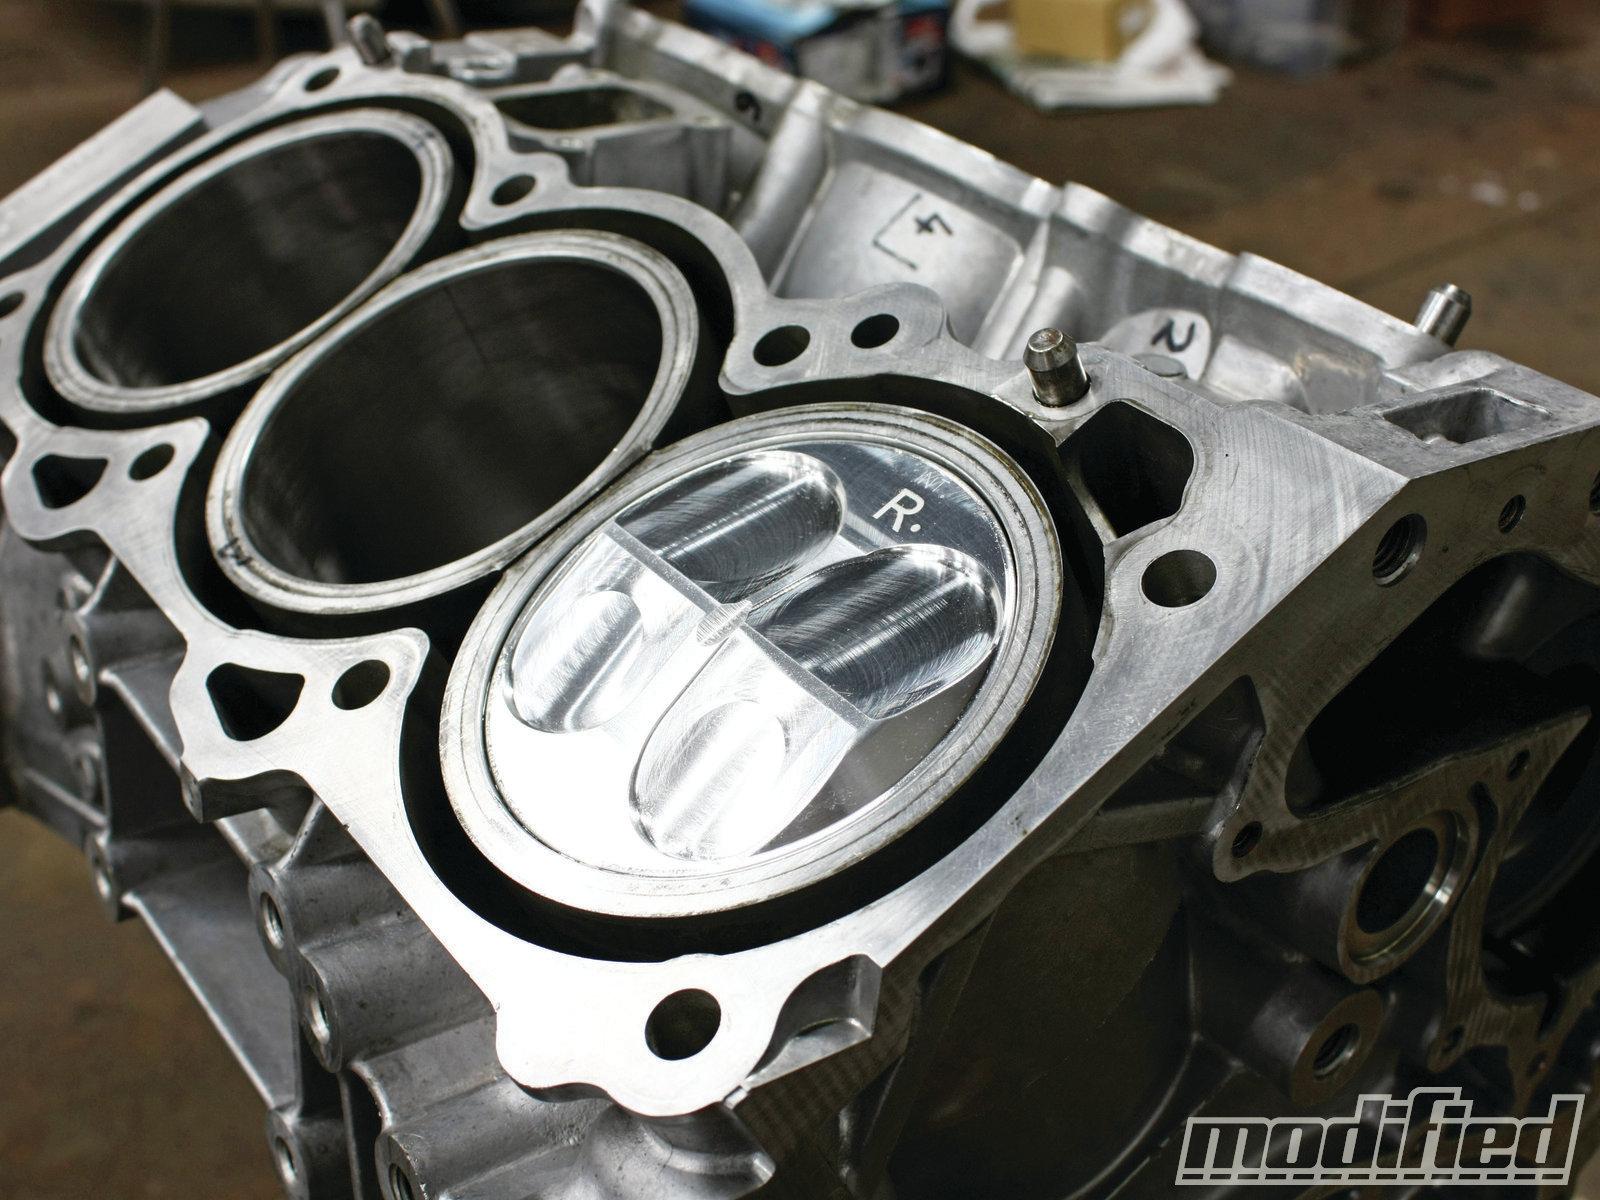 nissan-350z-vq35de-engine-build-wild-compression-pistons.jpg